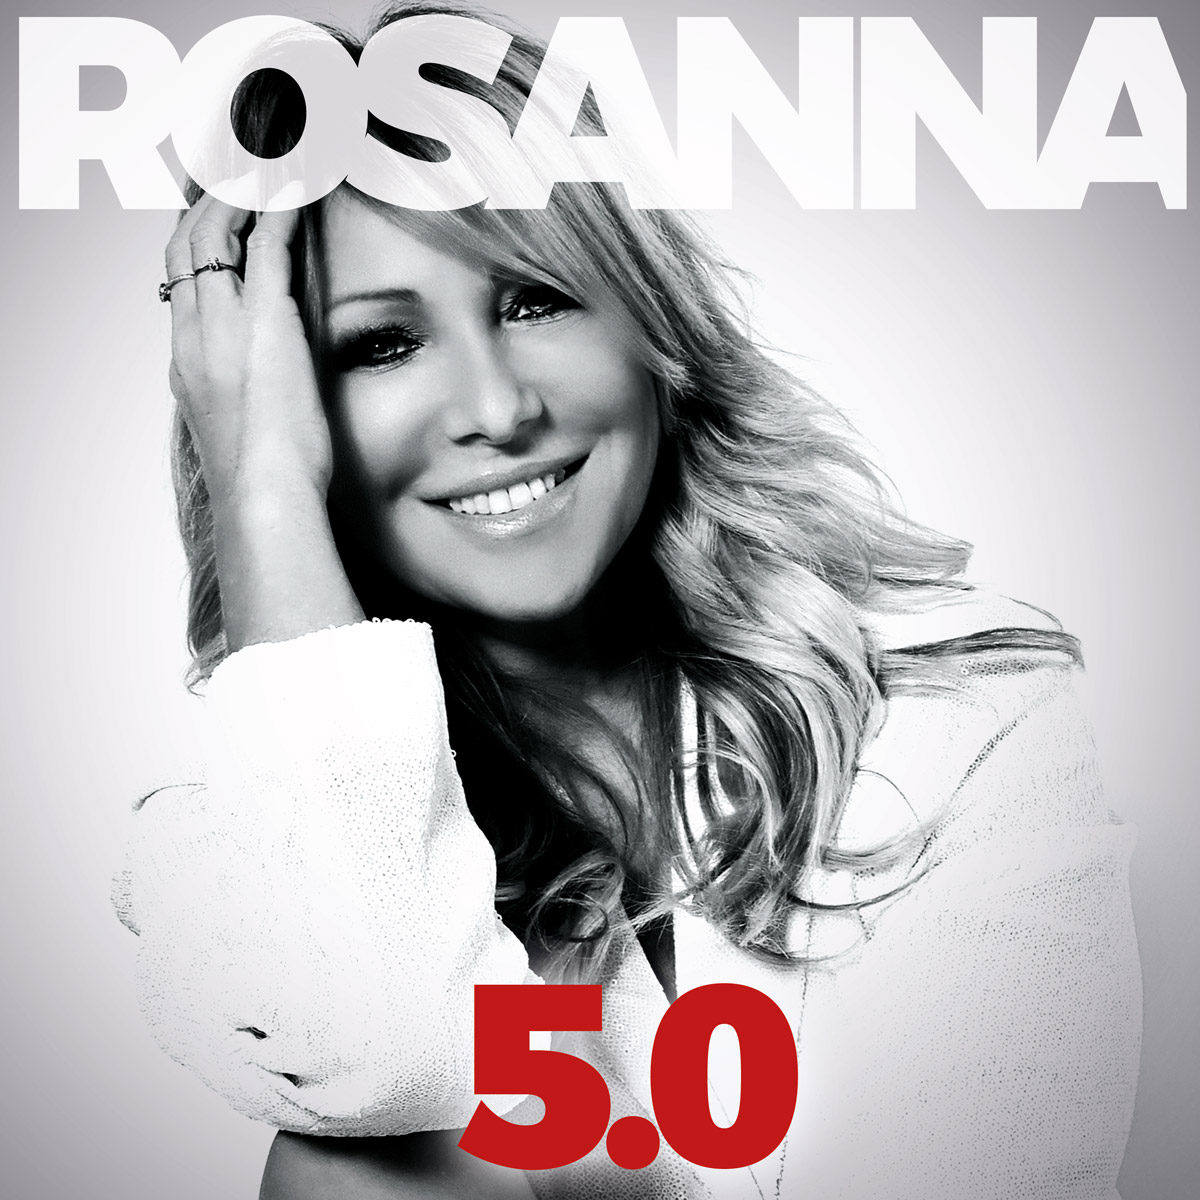 Rosanna Rocci Album 5.0